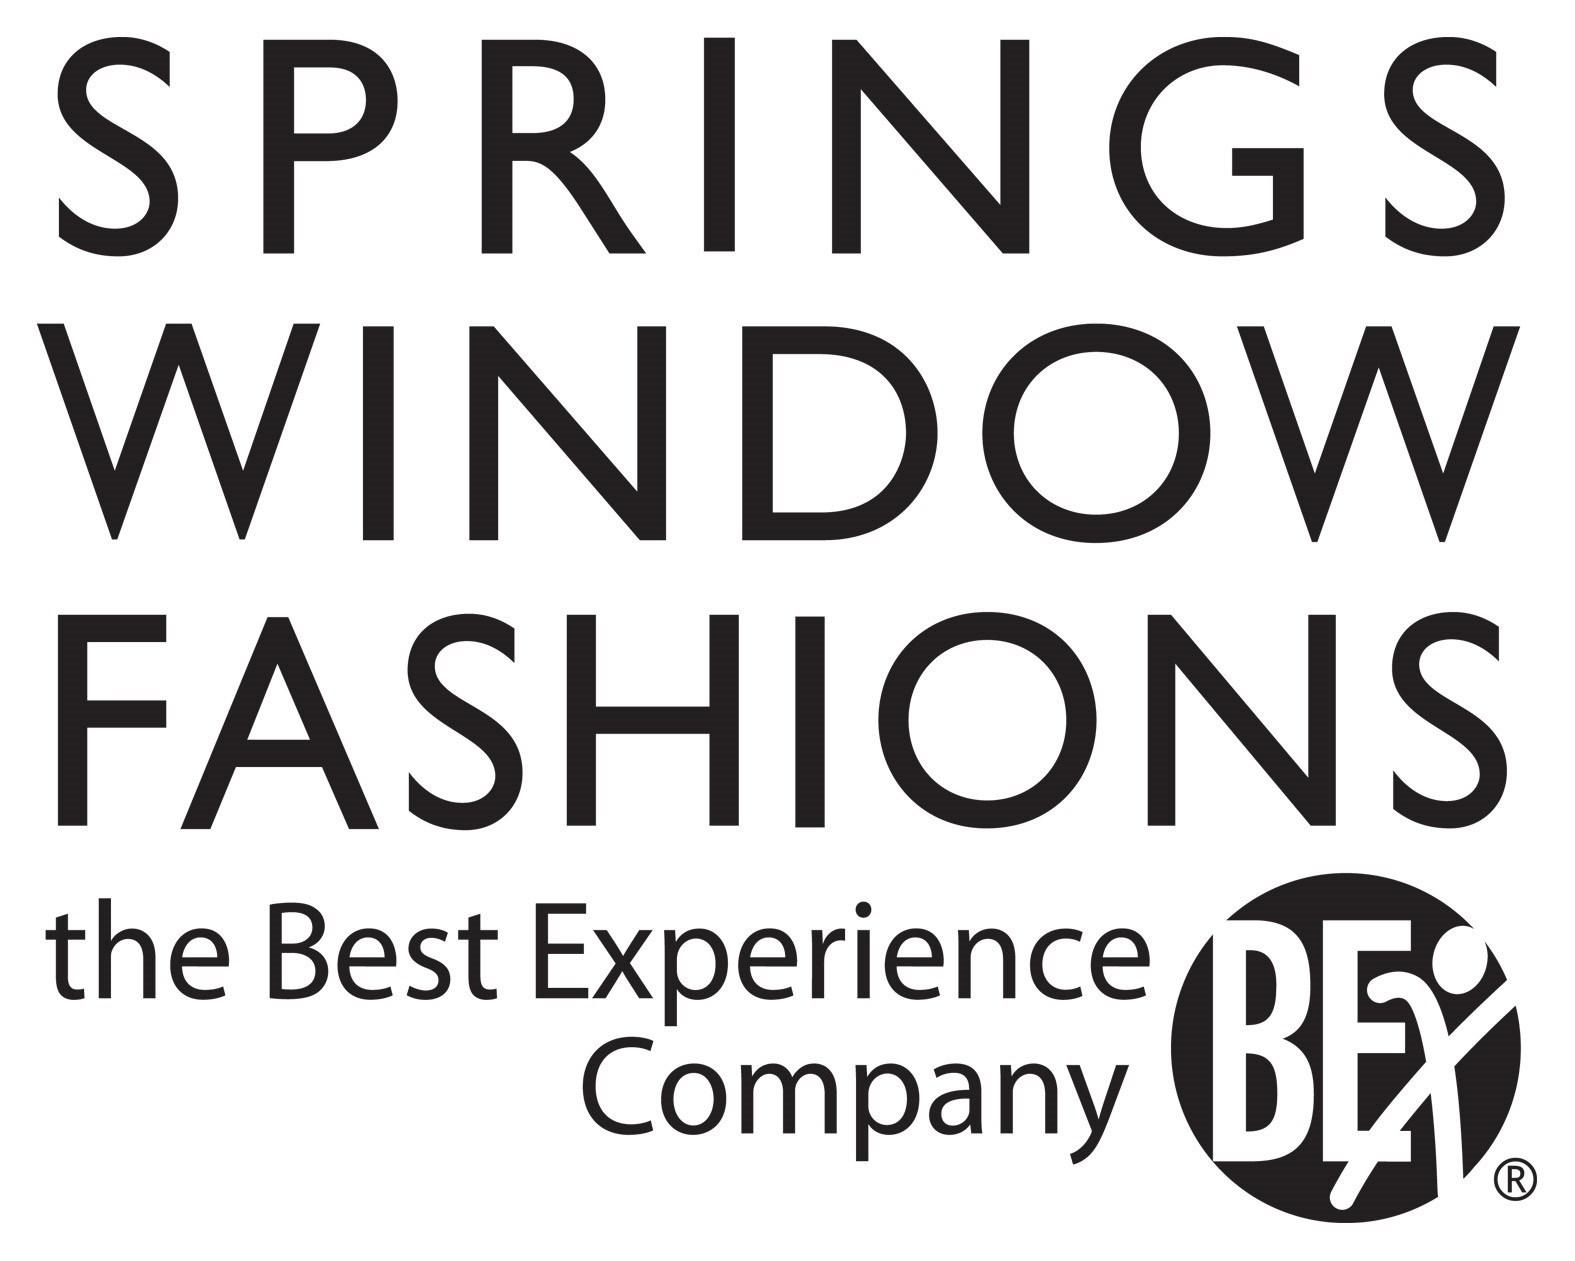 Springs window fashions de mexico 24